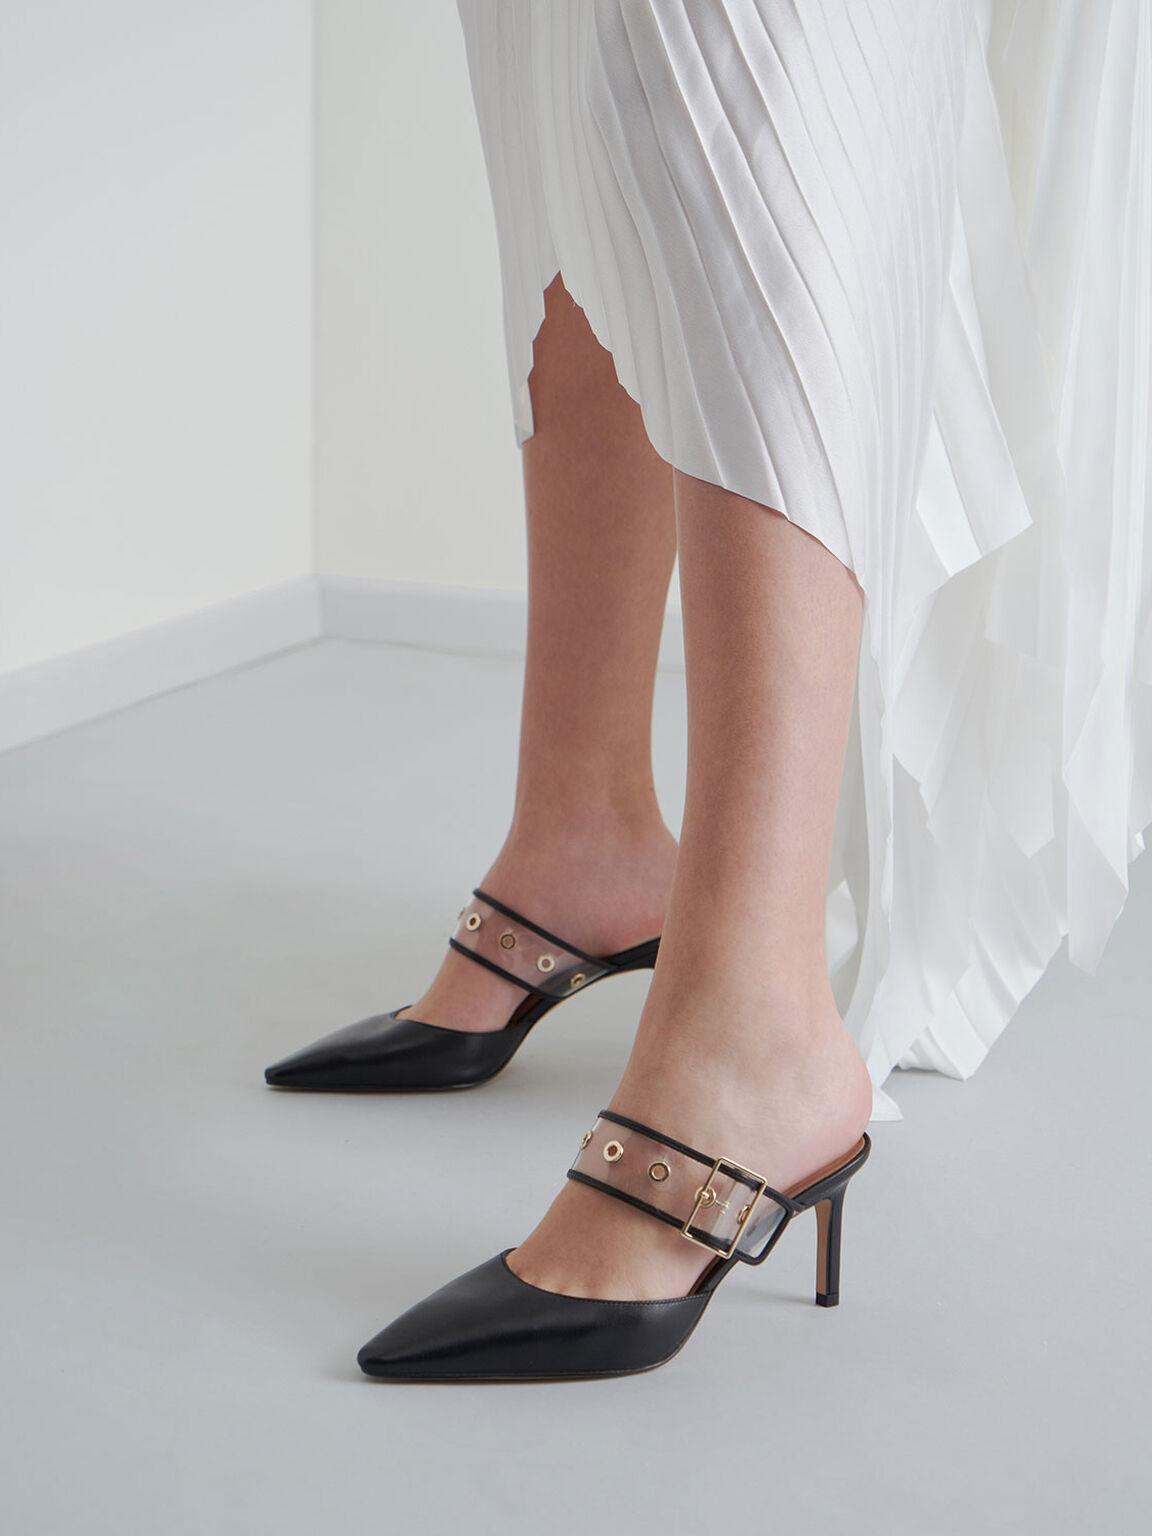 Leather Eyelet-Embellished Mules, Black, hi-res